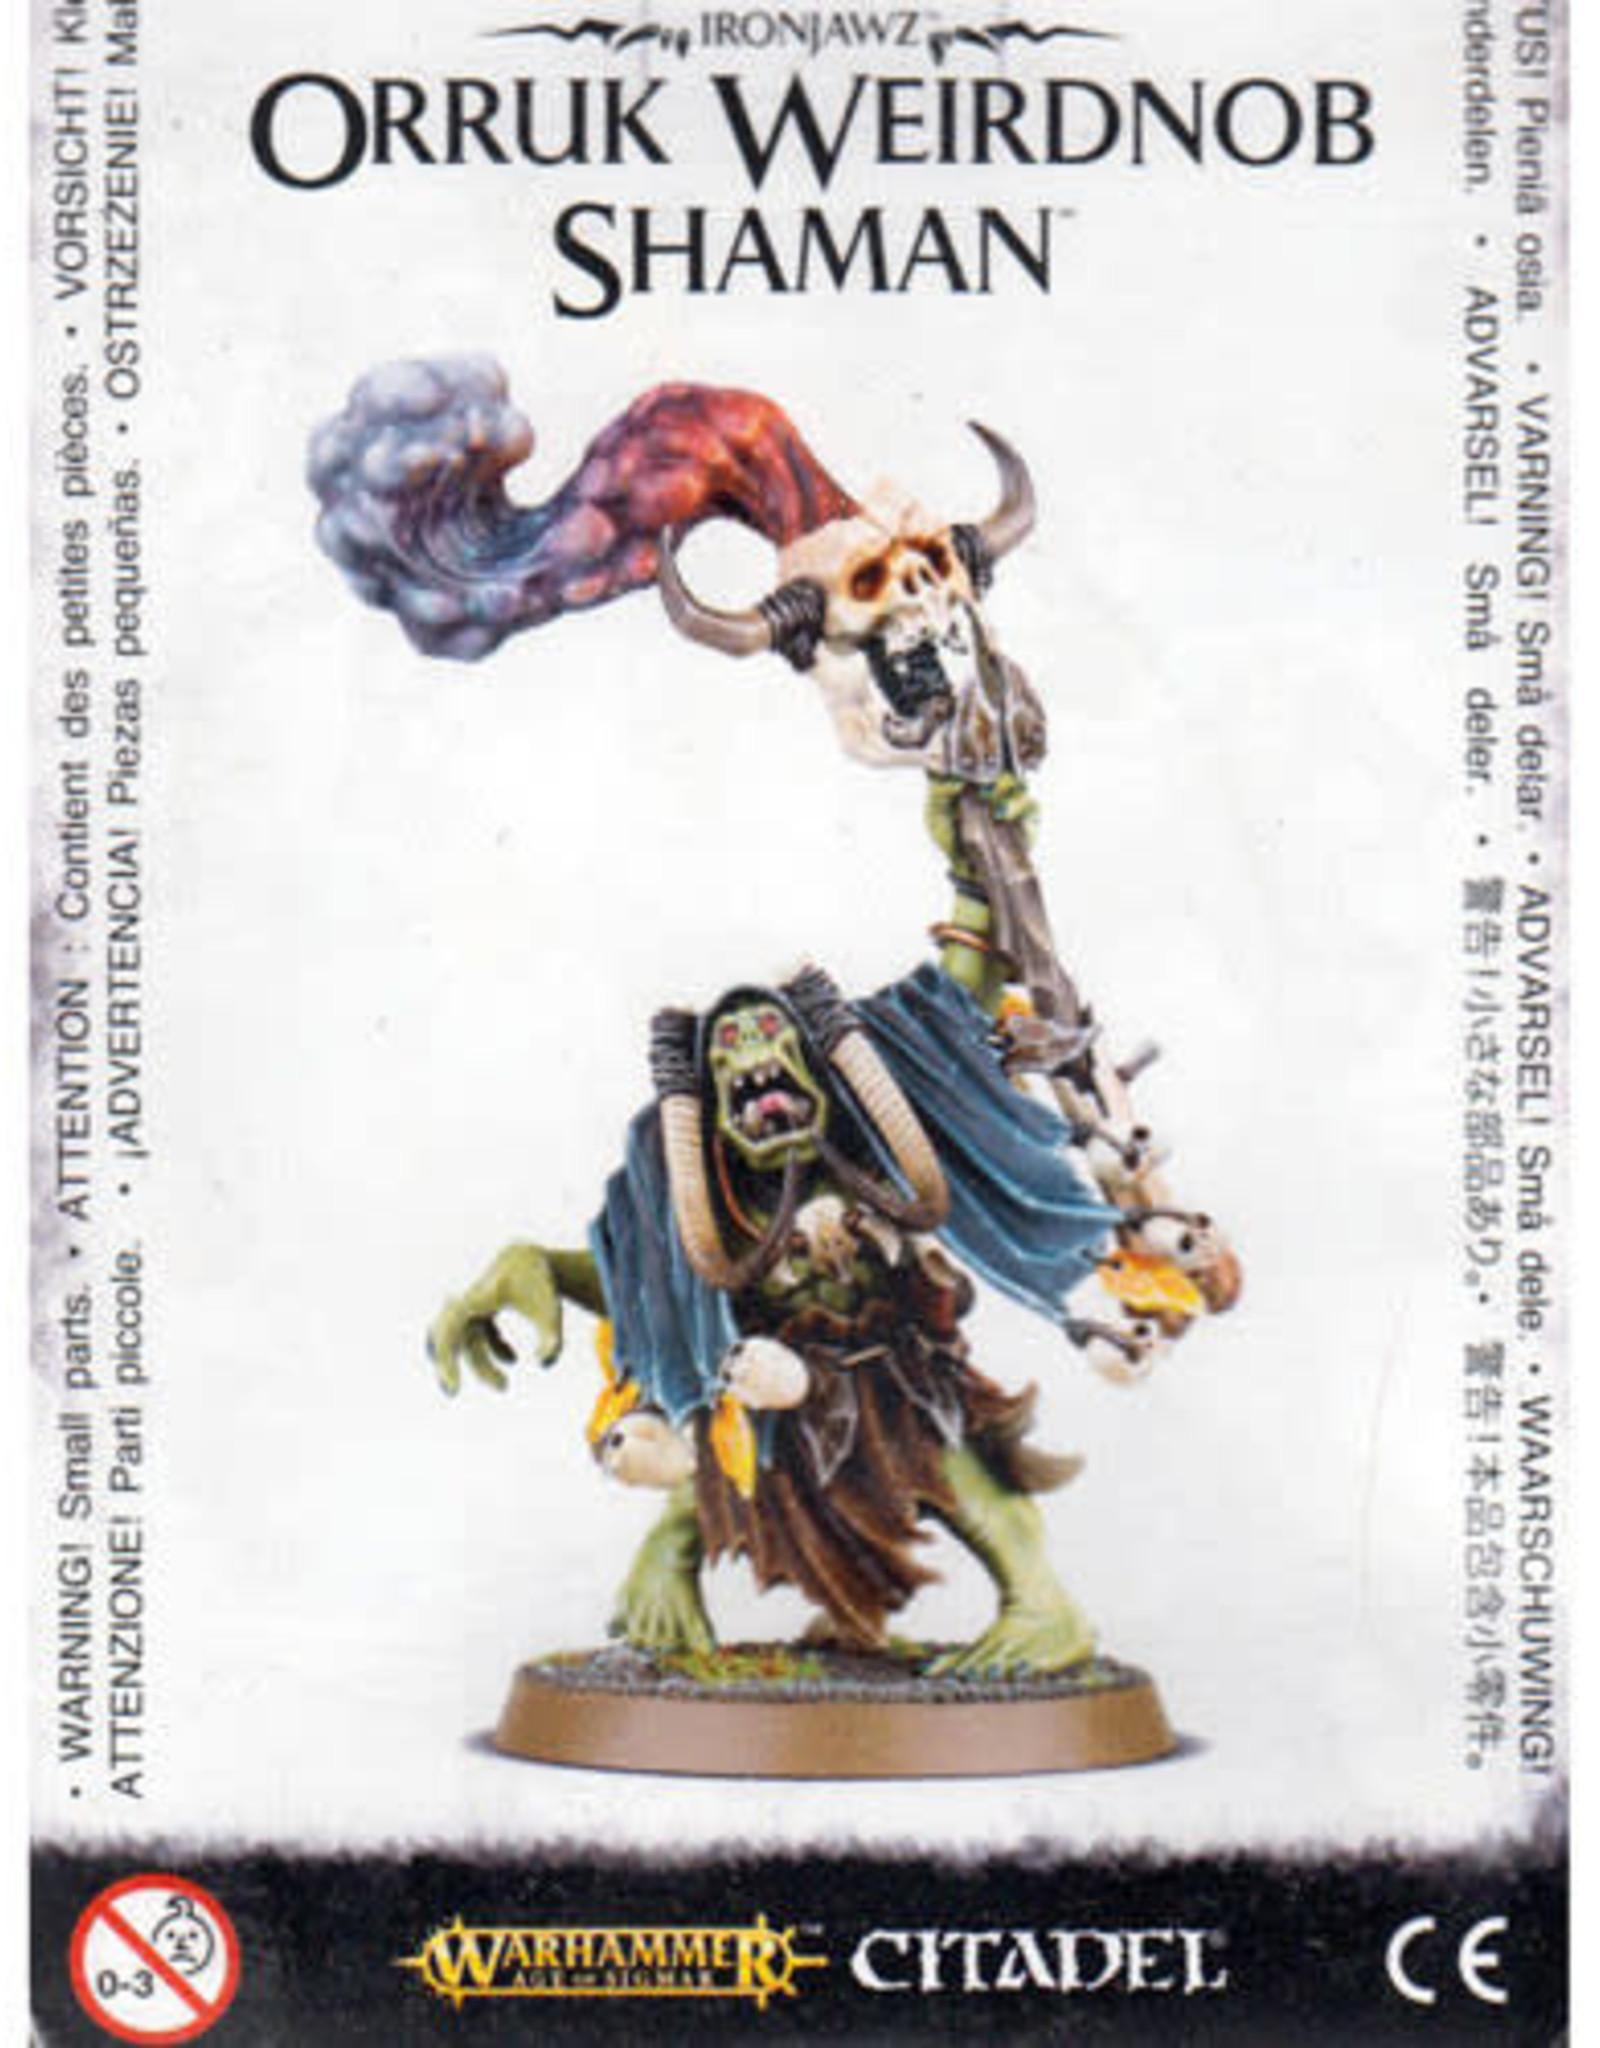 Age of Sigmar Ironjawz Orruk Weirdnob Shaman